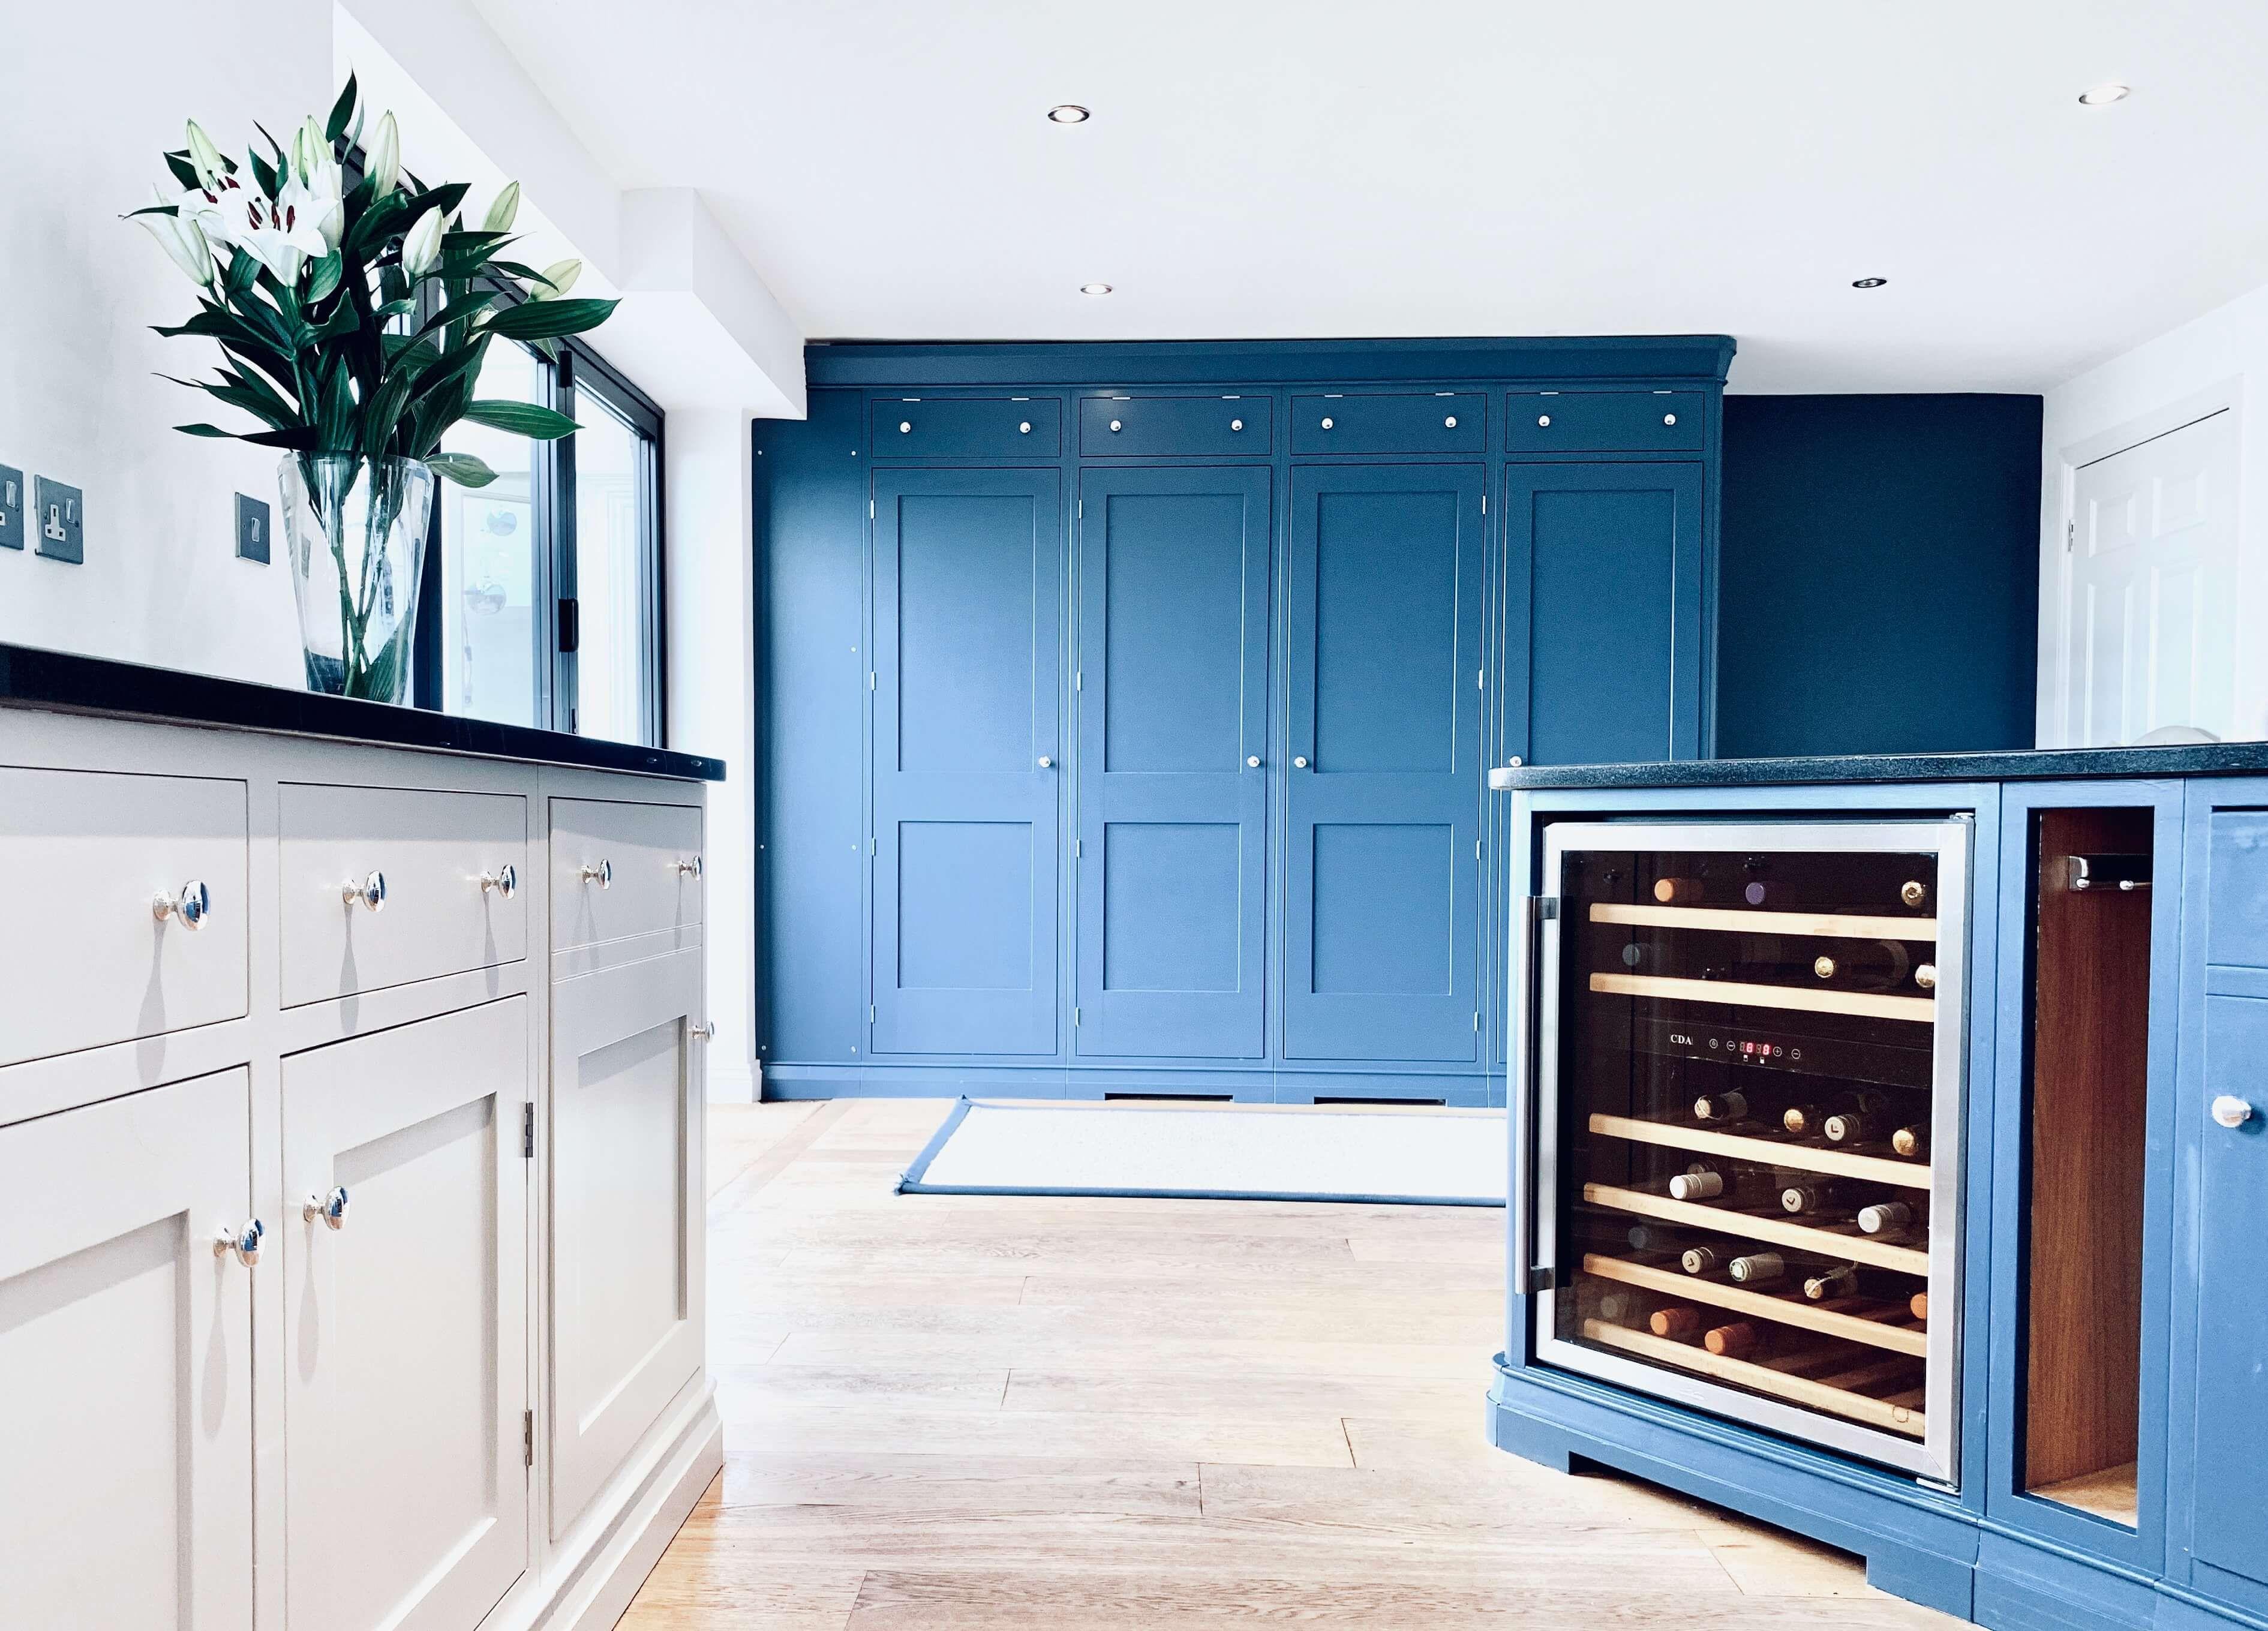 Best Kitchen Larder Cabinets Painted In Farrow Ball Stiffkey 400 x 300